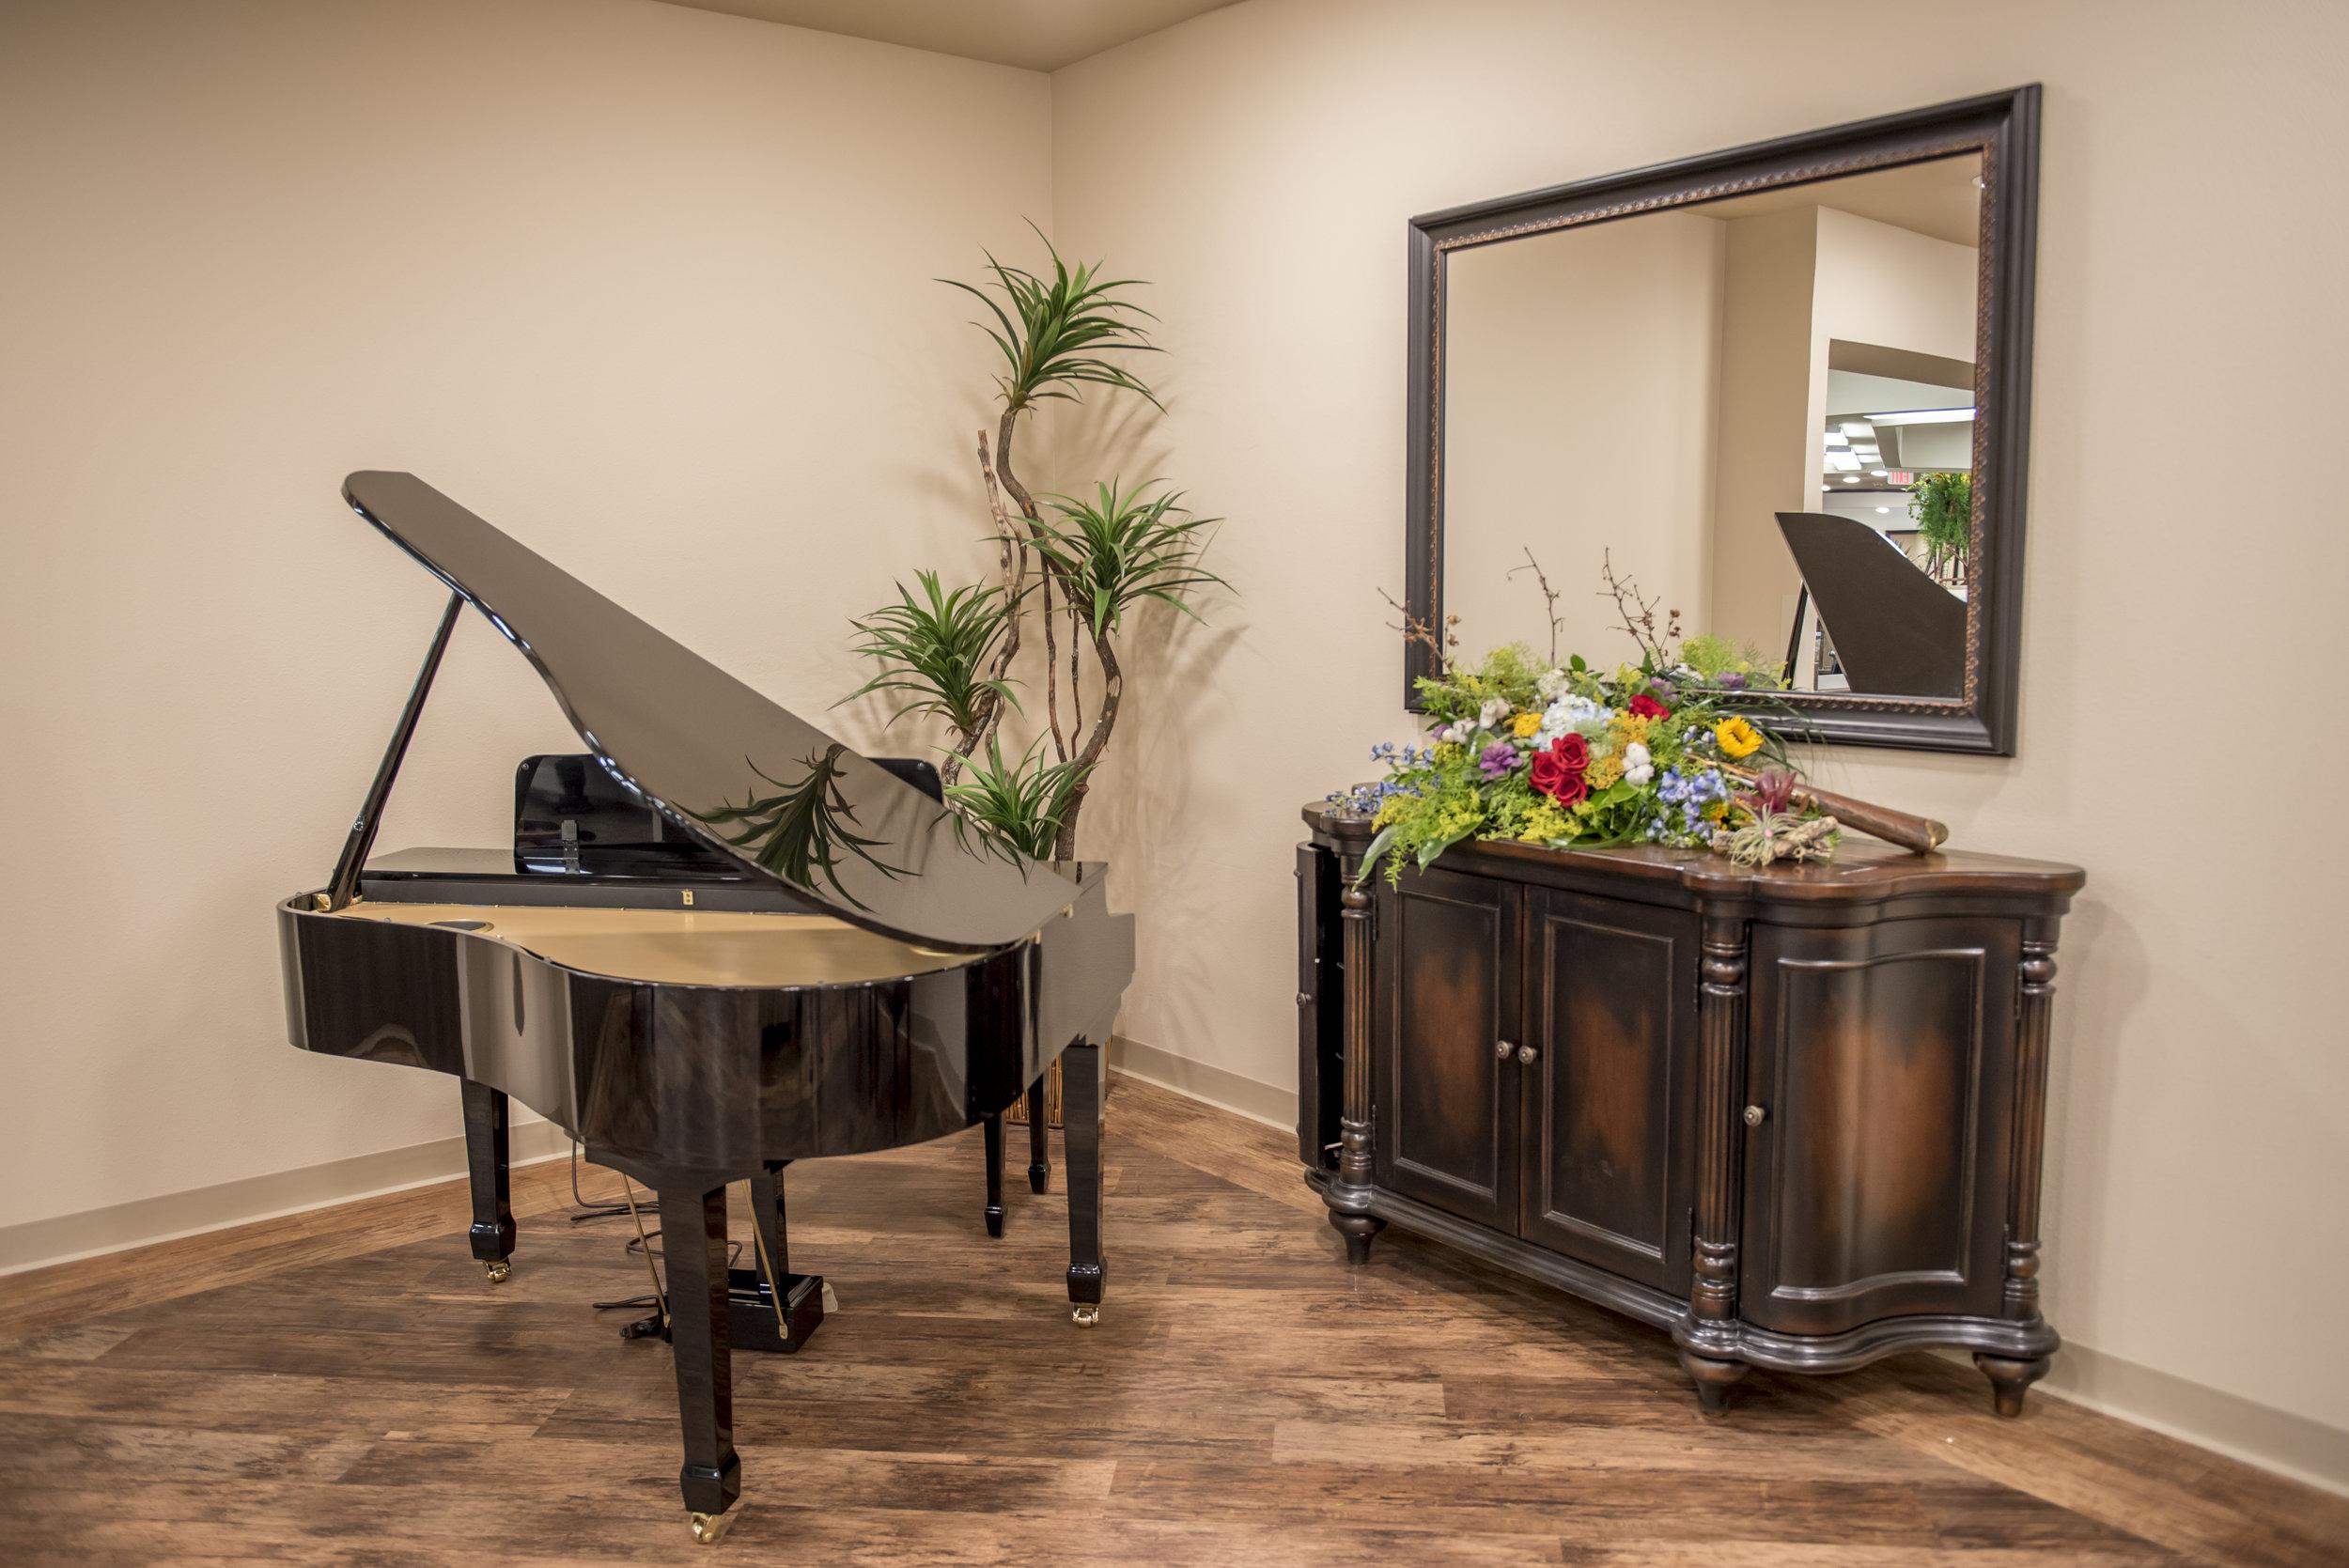 grand-piano-nursing-home-wichita-falls-texas-sheridan-medical-lodge.jpg